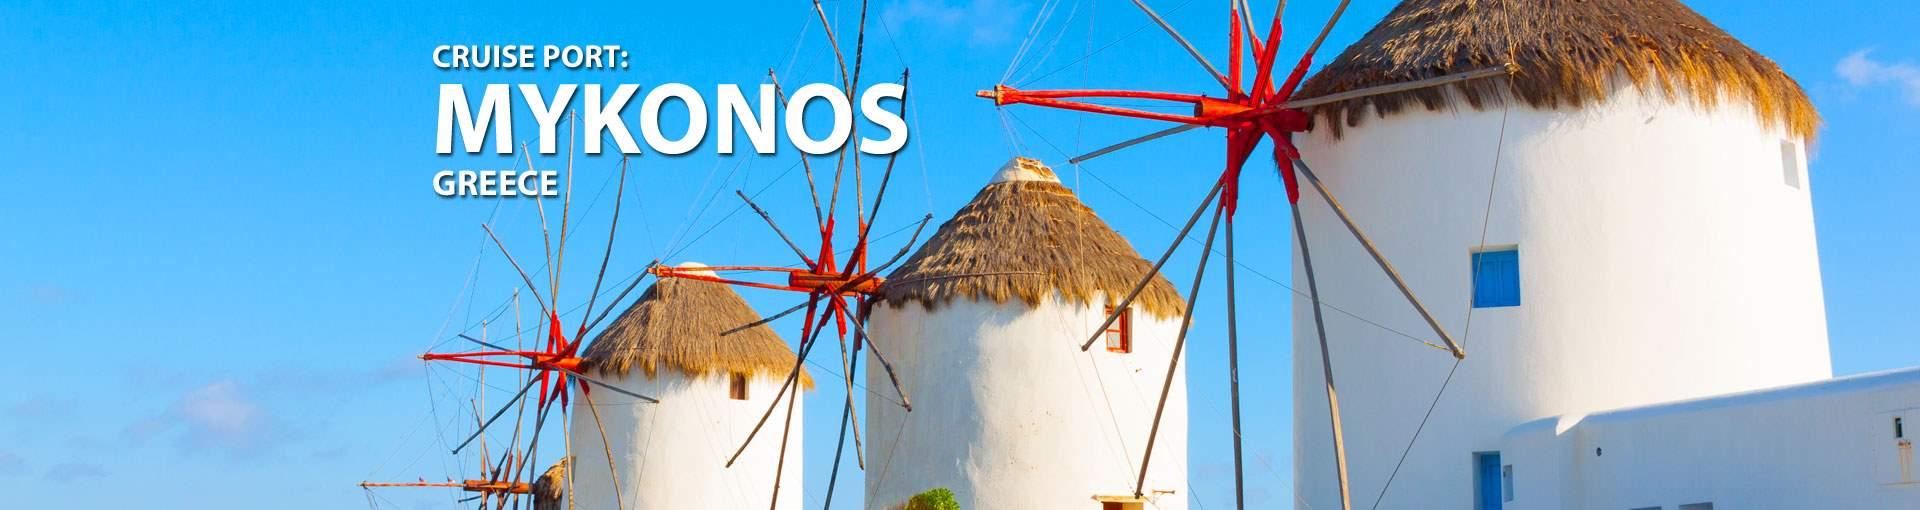 Cruises to Mykonos, Greece